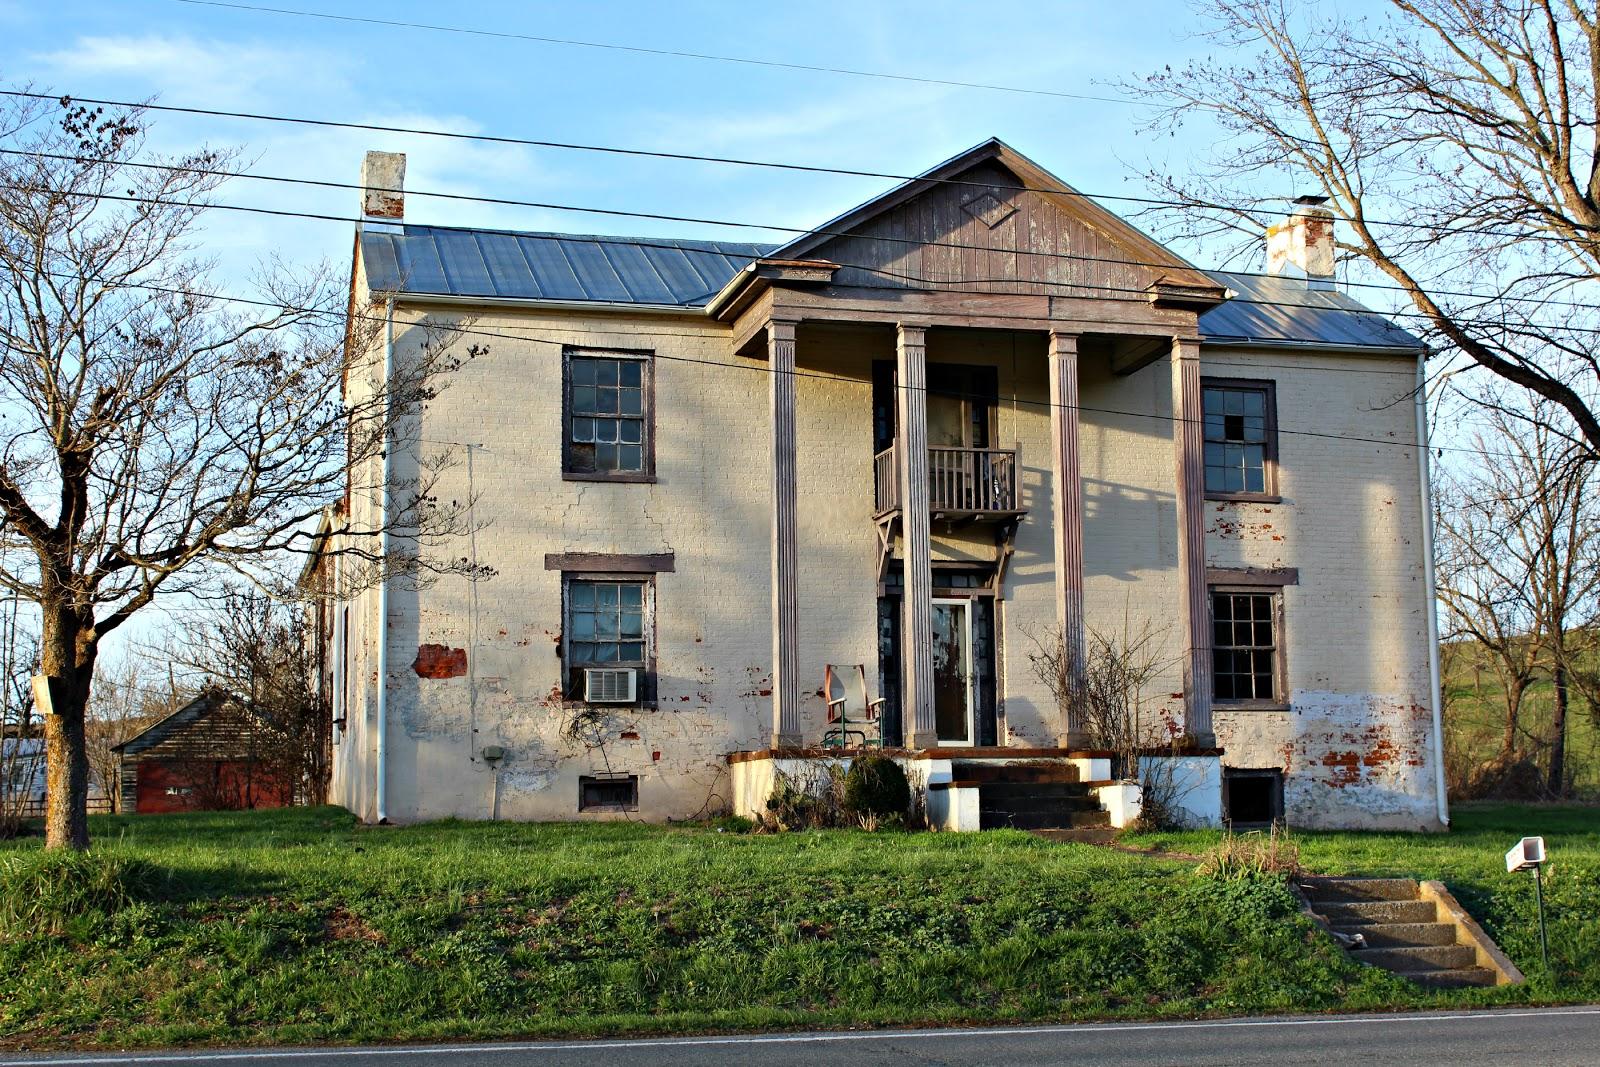 Around Roanoke Va A Daily Photo Blog Through My Lens An Old House